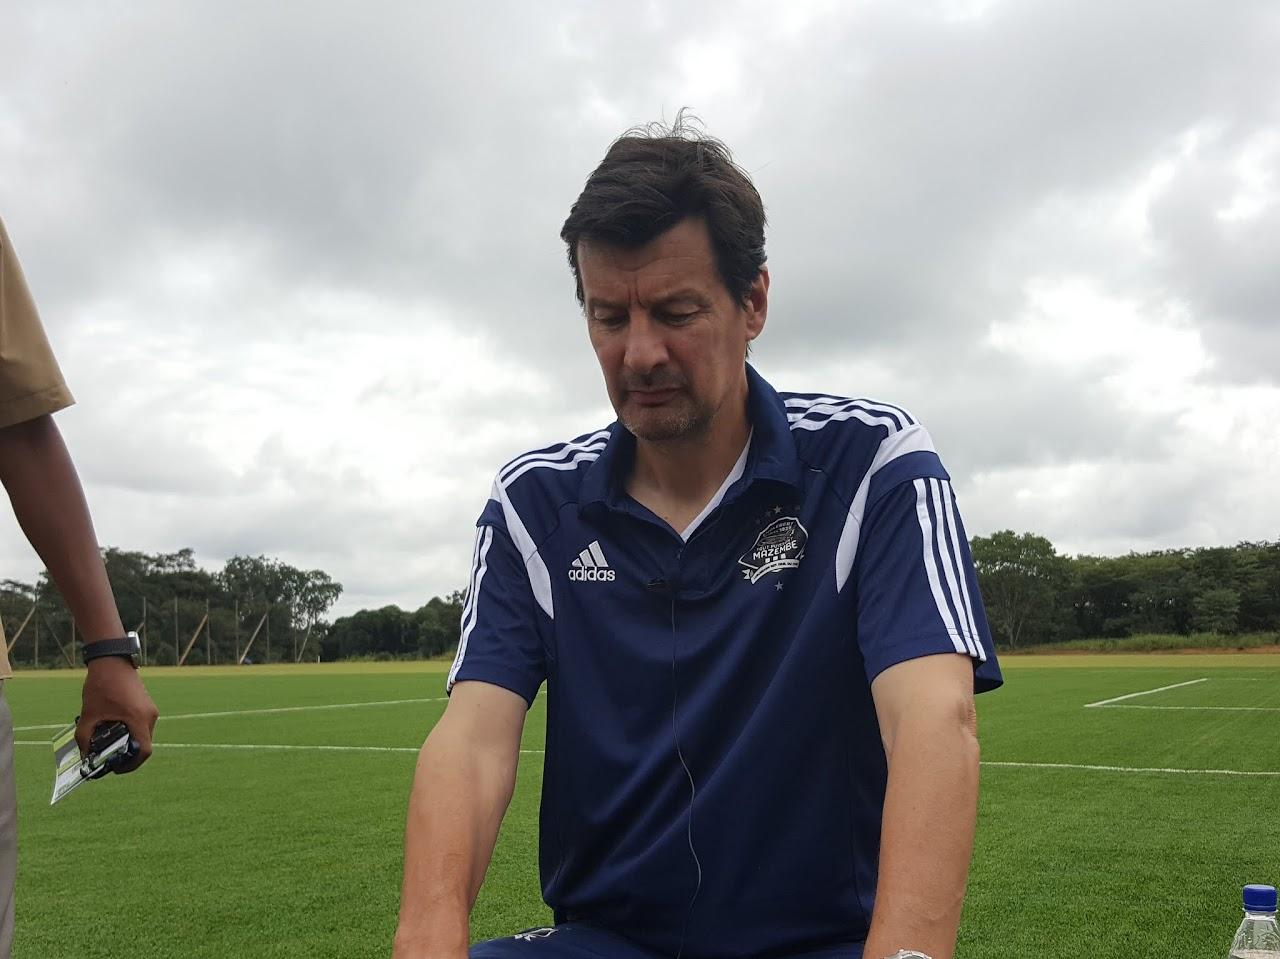 Le TP Mazembe limoge son entraîneur